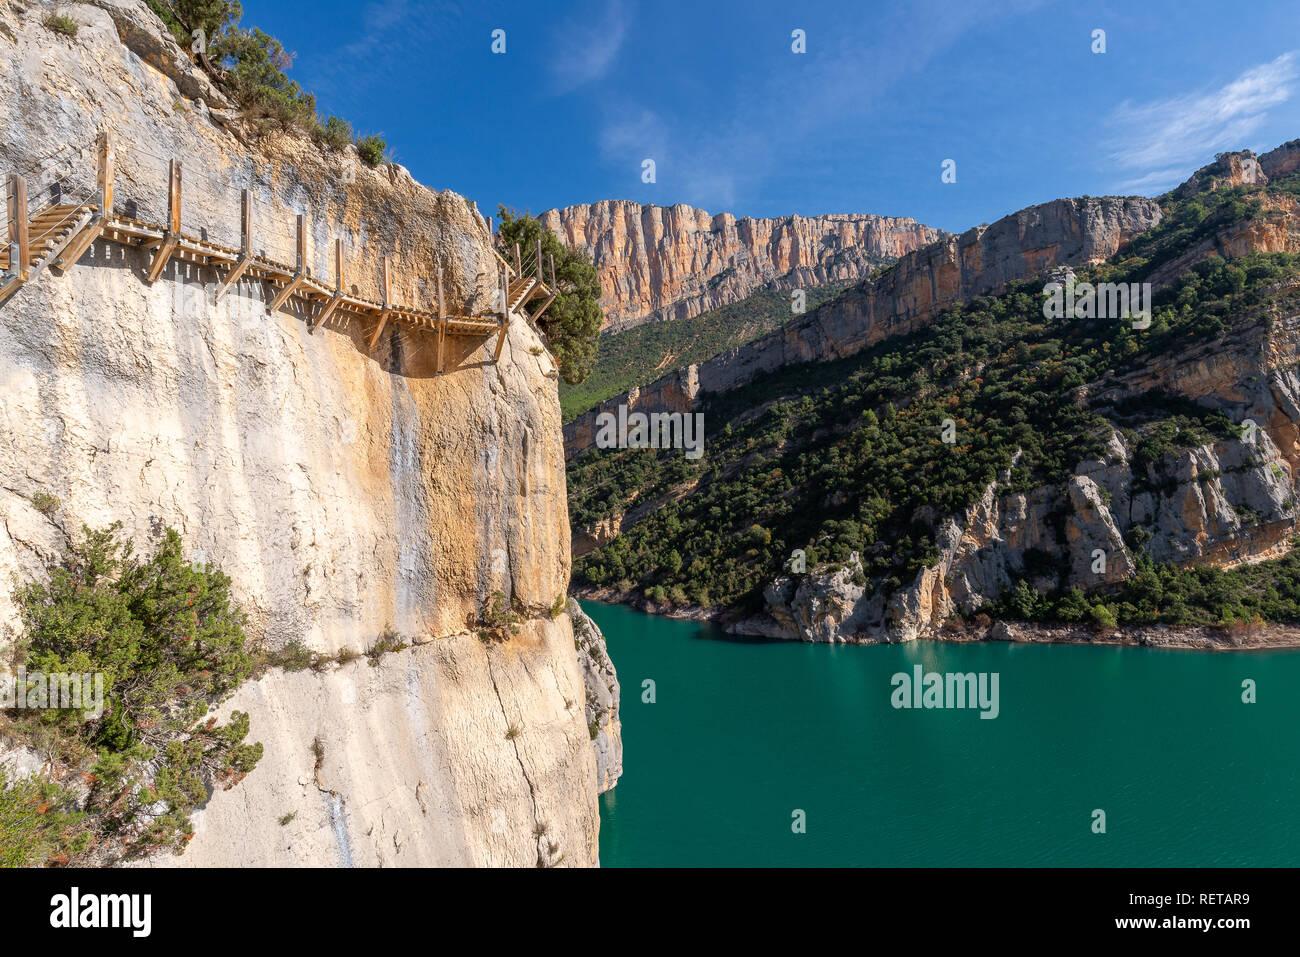 Montfalco footpath, Huesca province, Spain - Stock Image